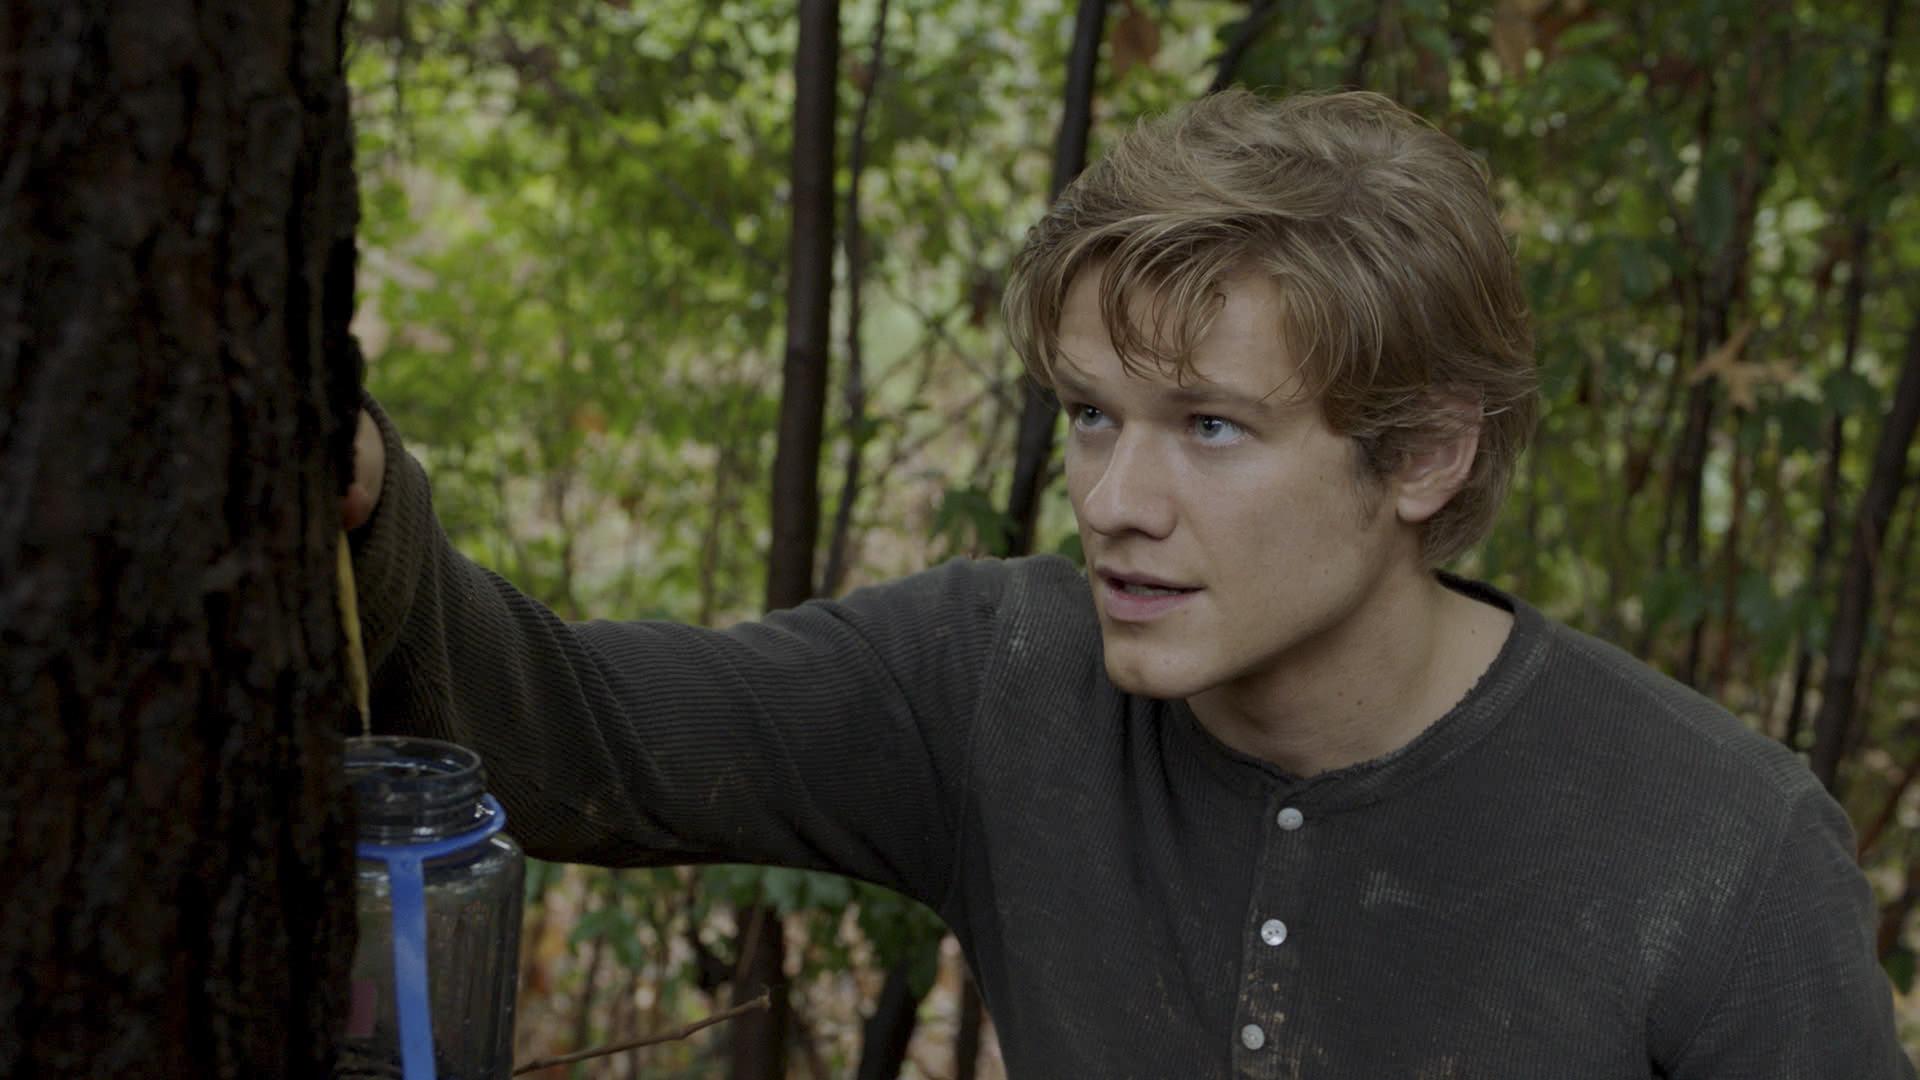 MacGyver surveys the scene around him.